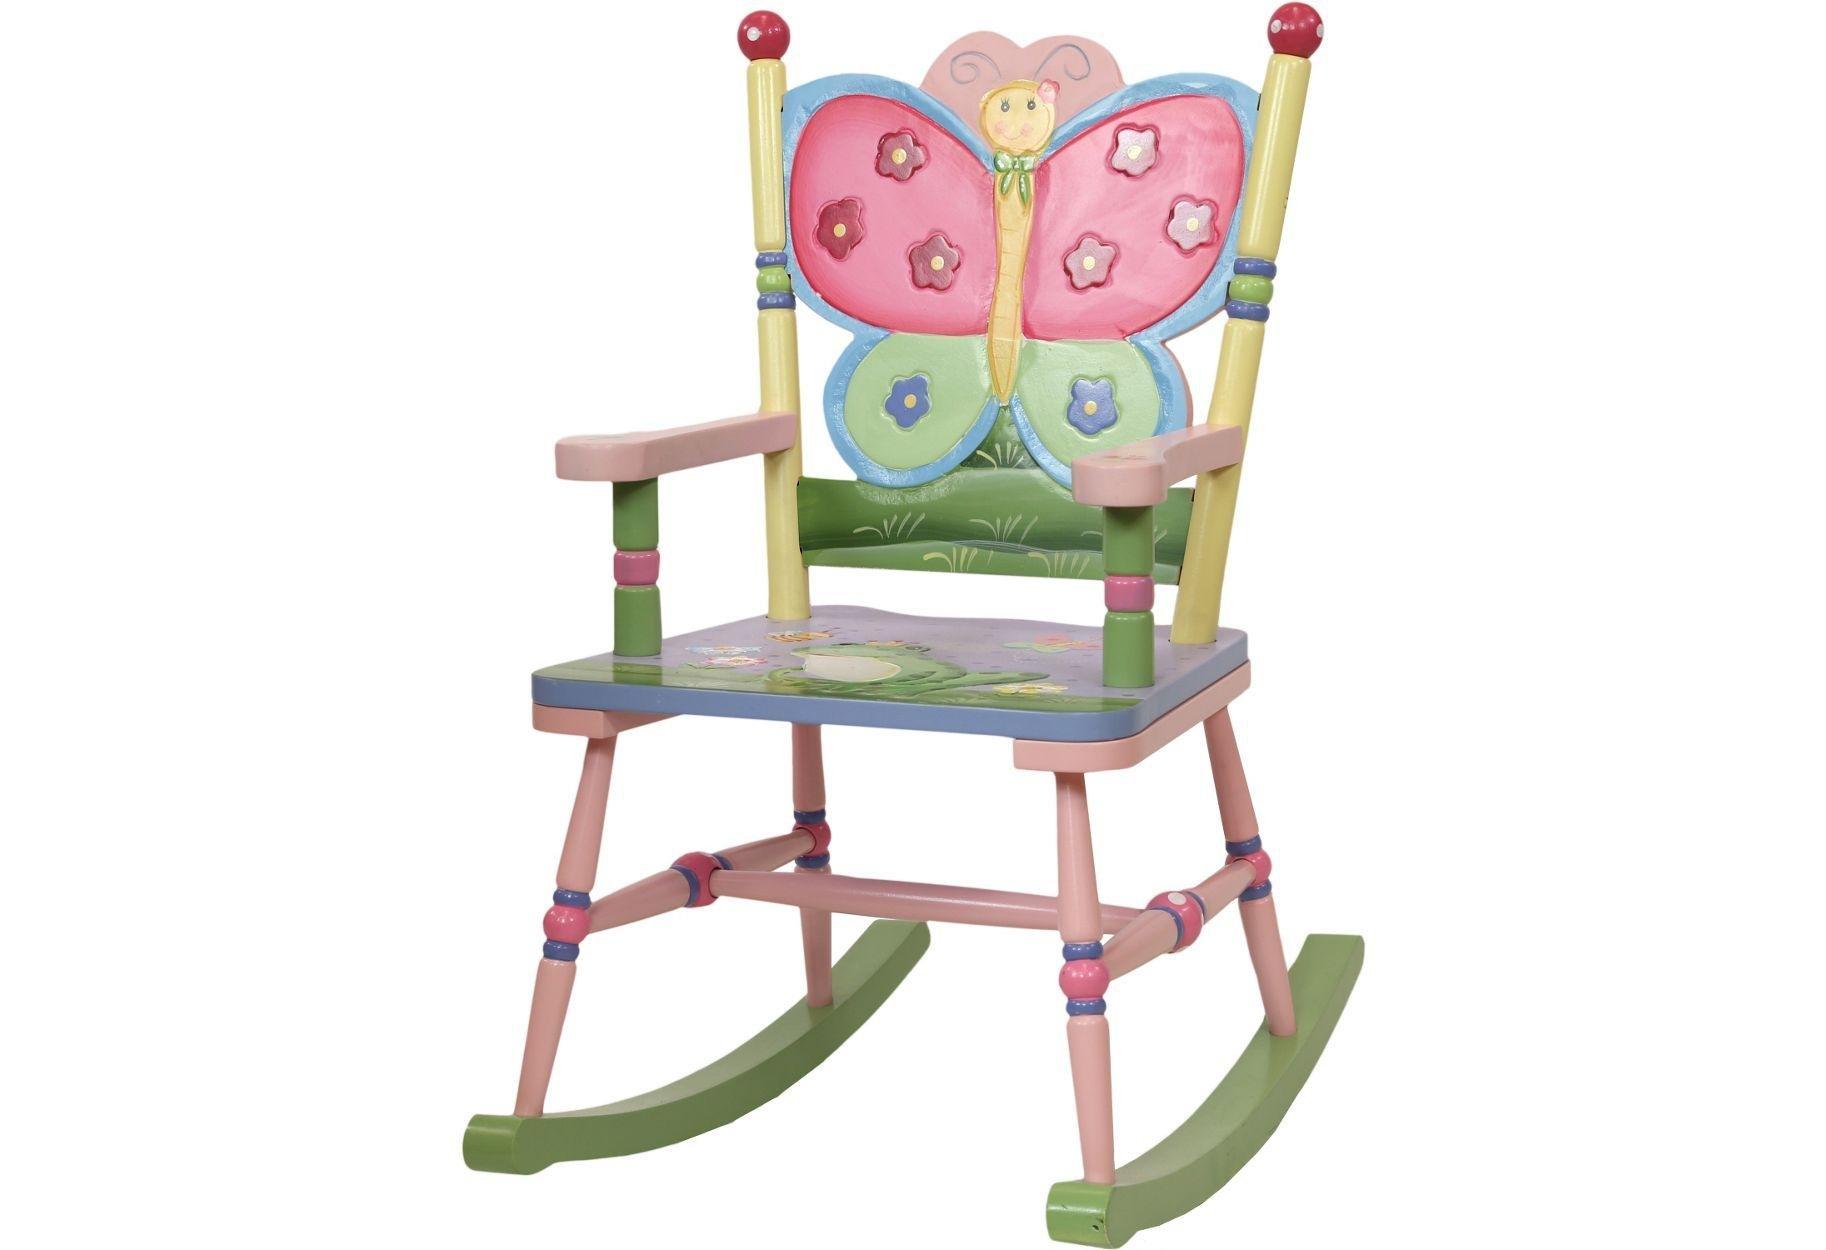 Image of Fantasy Fields Magic Garden Rocking Chair.